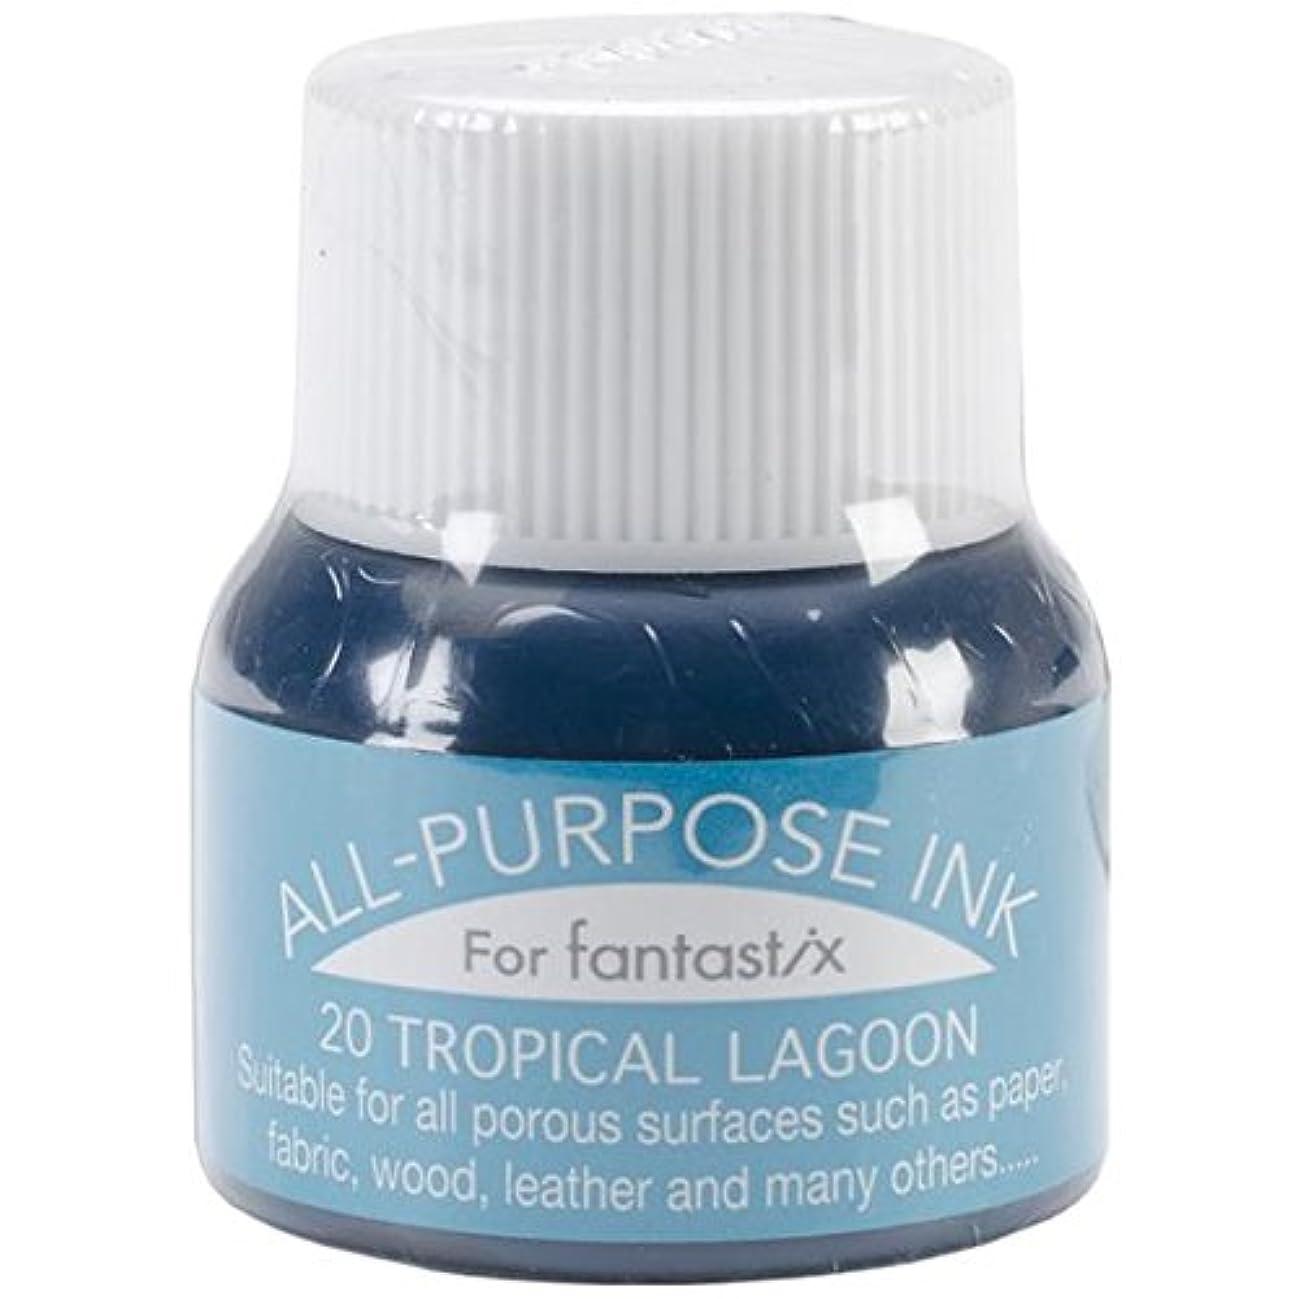 Tsukineko 0.5-Fluid-Ounce All Purpose Ink, Tropical Lagoon